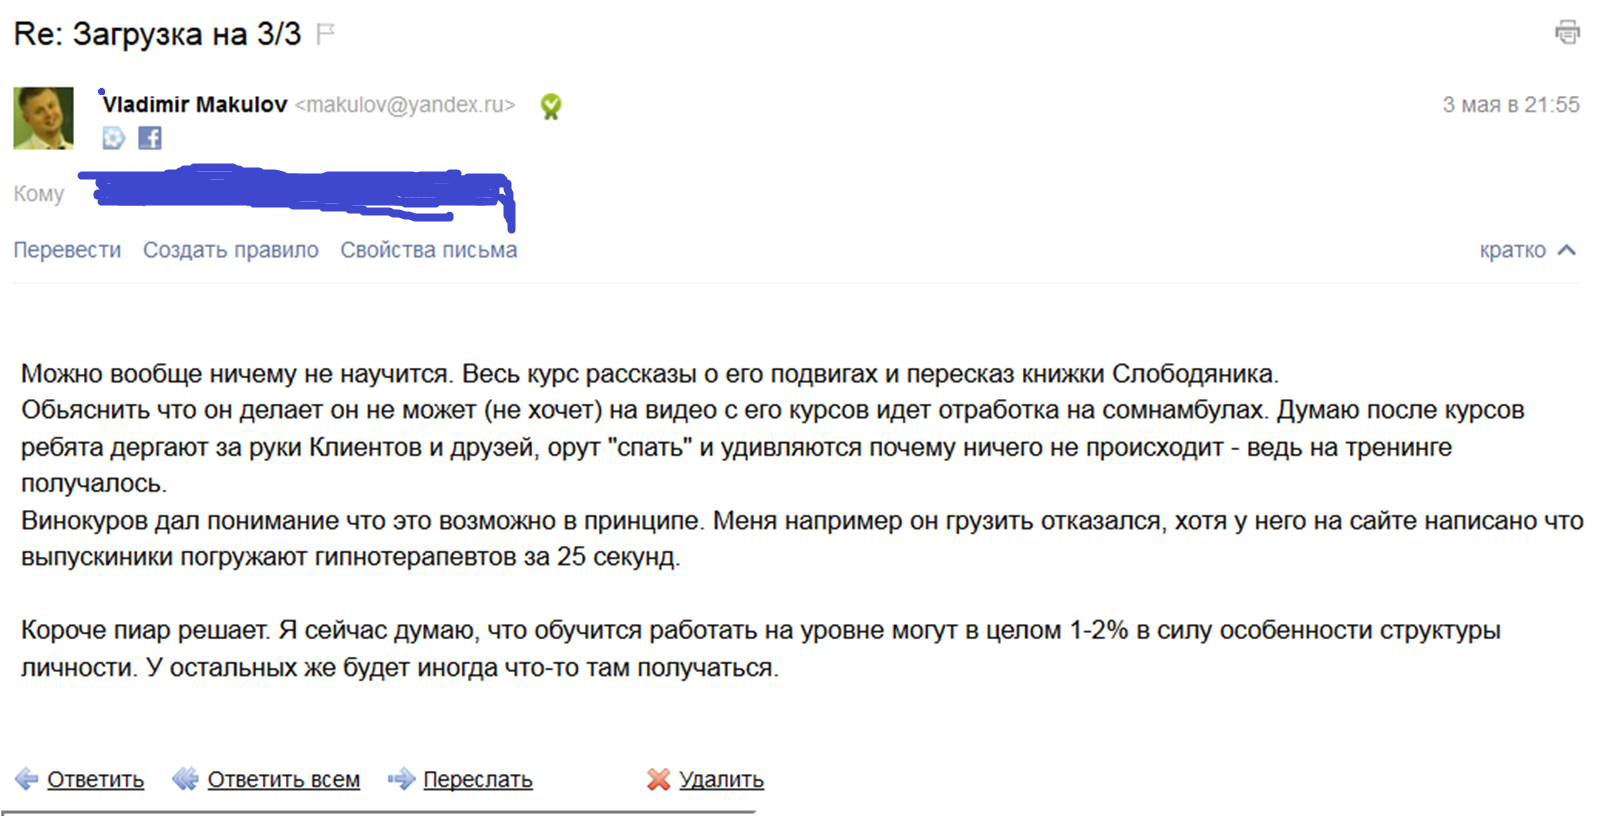 Переписка Винокуров 2